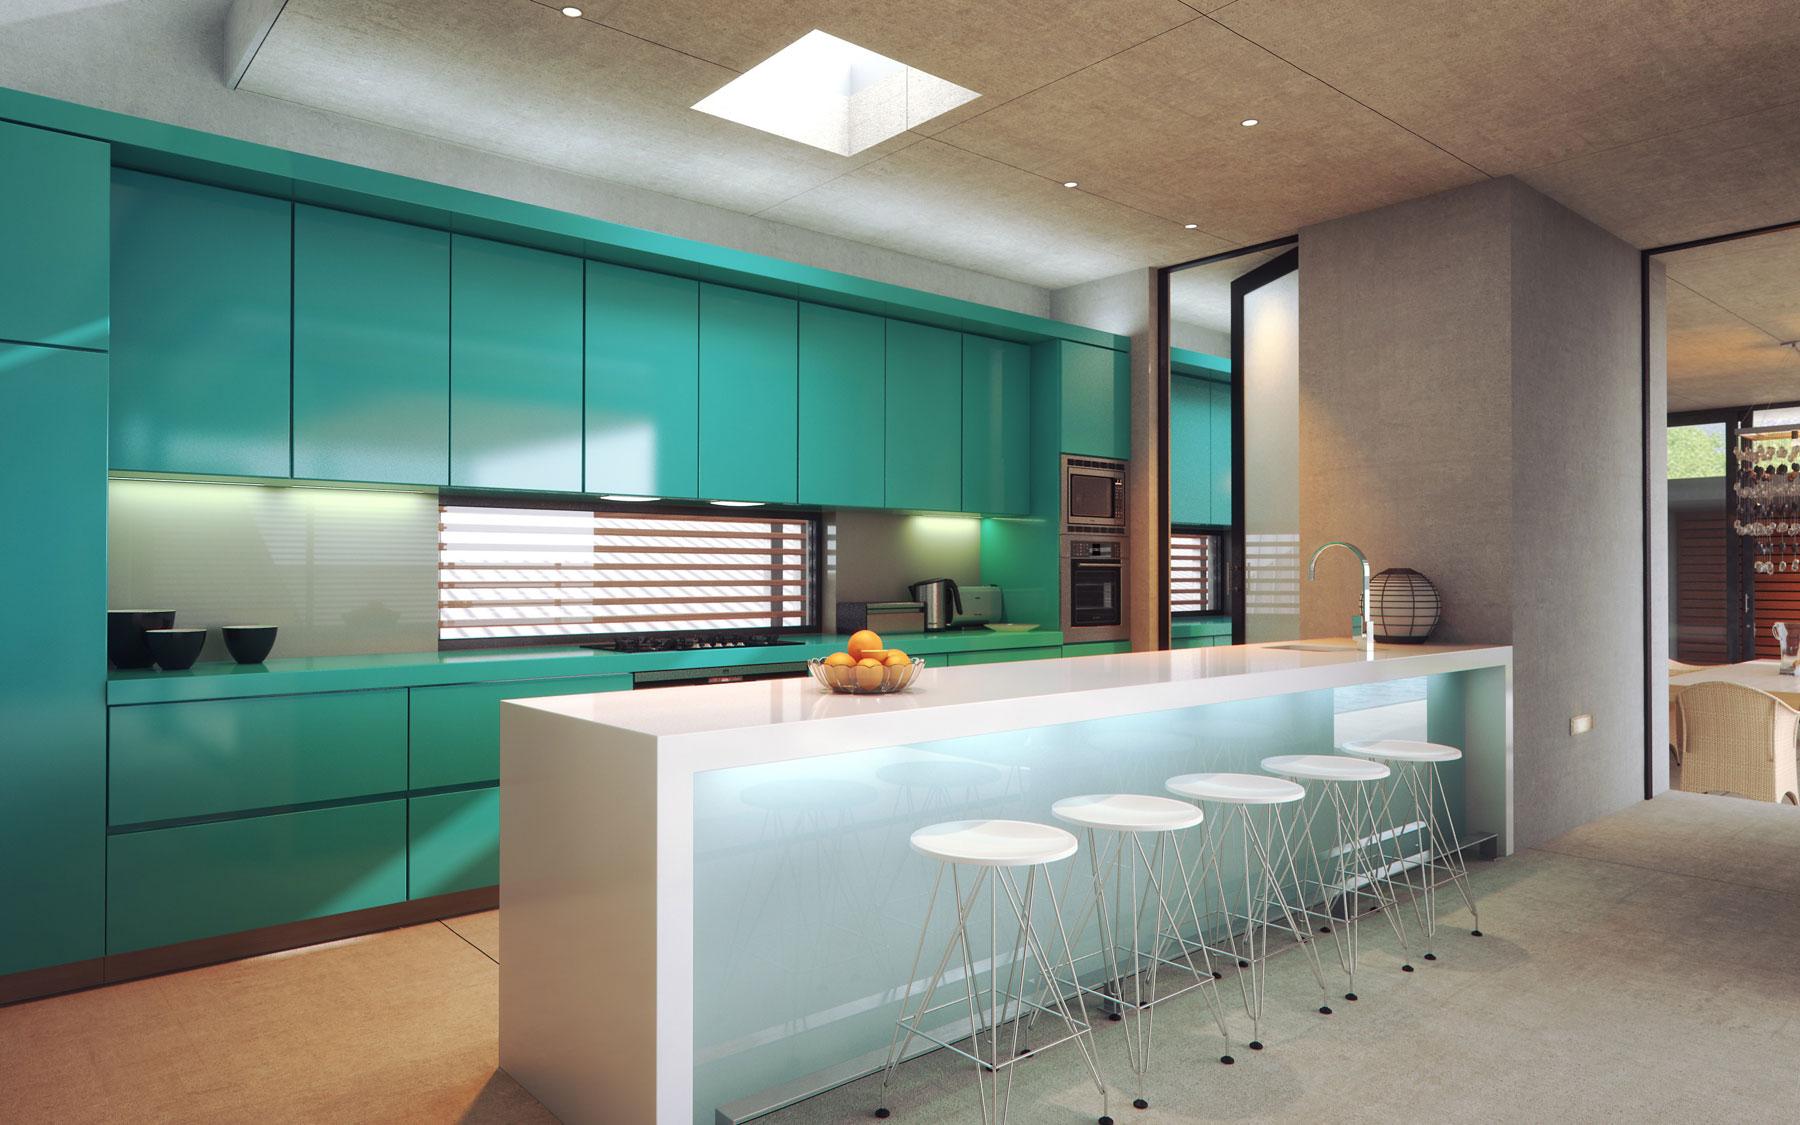 Imilk Info Muebles De Cocina Turquesa Ideas De Cocina De Diseno